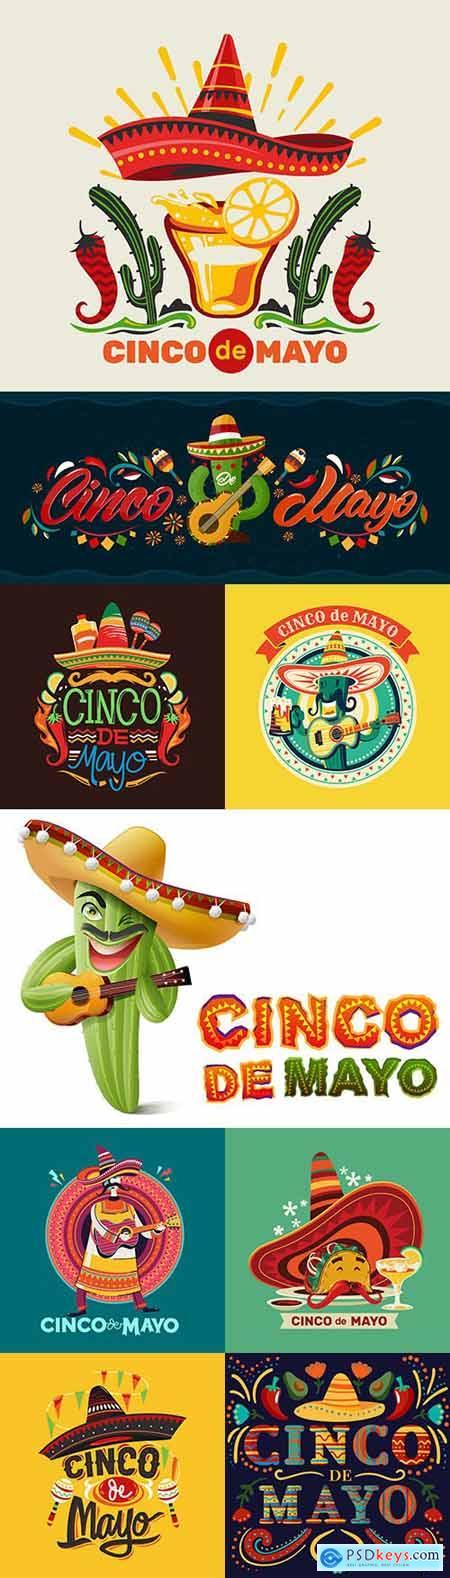 Synco de Mayo Mexican holiday premium illustration